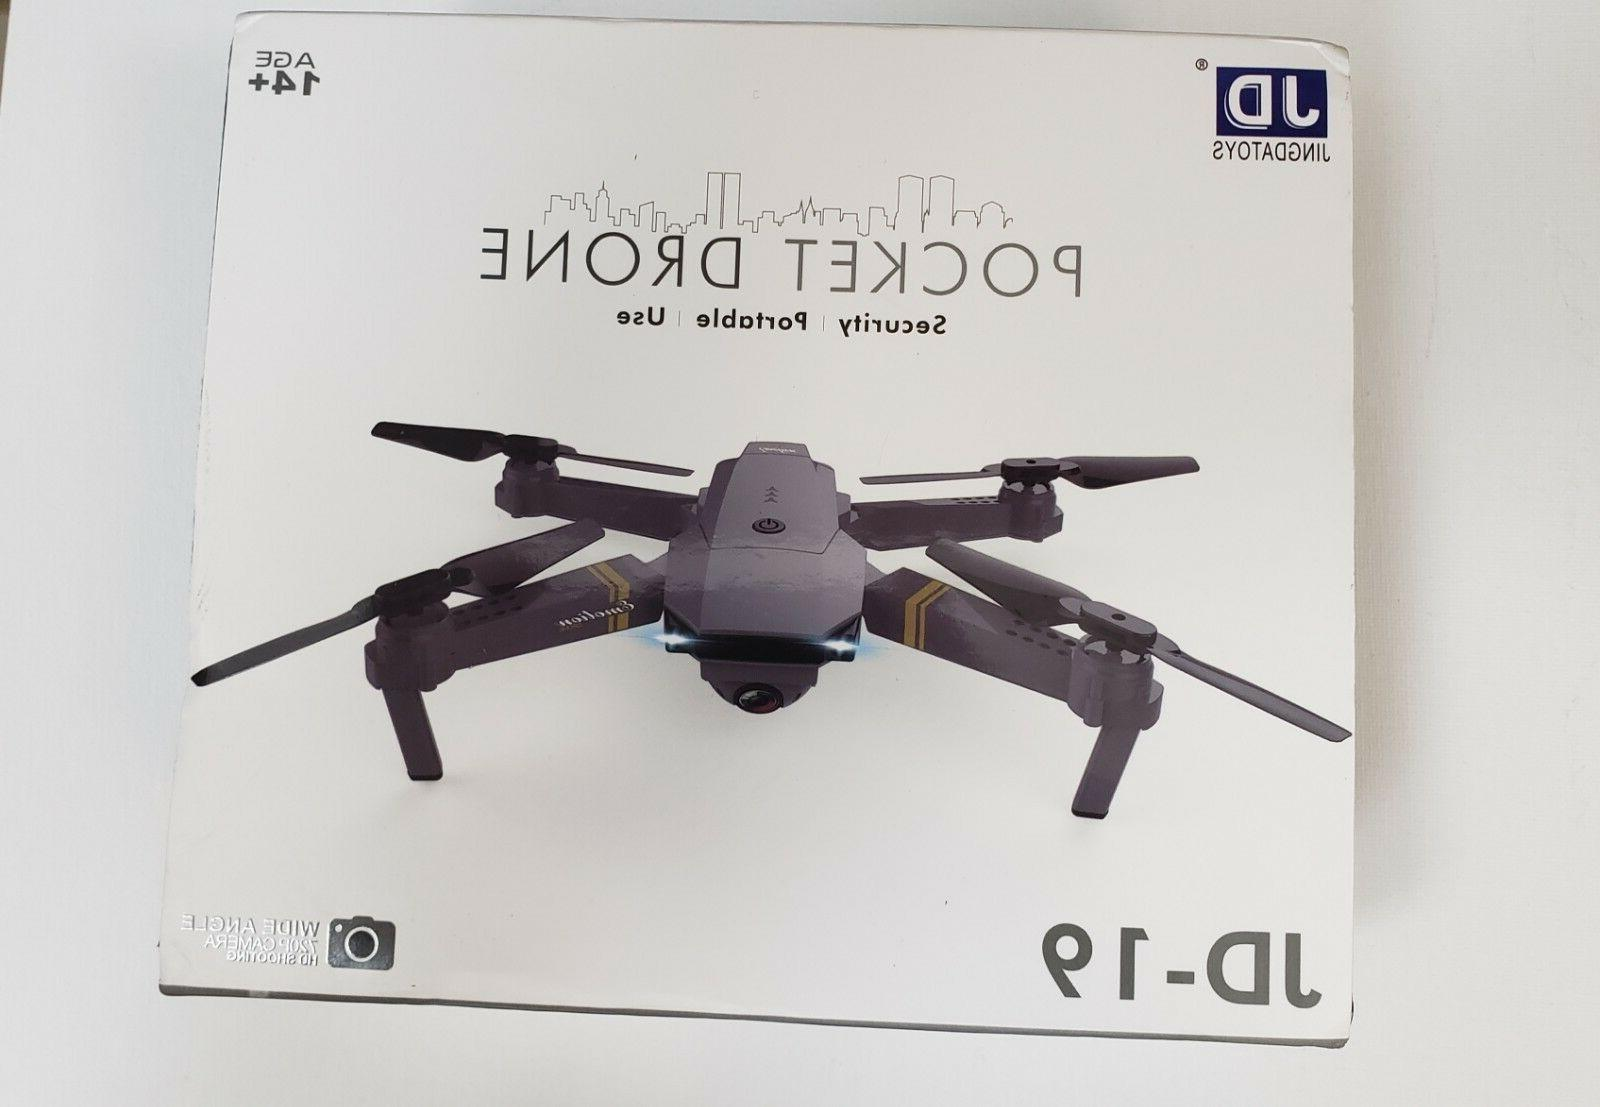 JD-19 Pocket Drone   HD Camera   WiFi   2.4 GHz   6 Axis   3